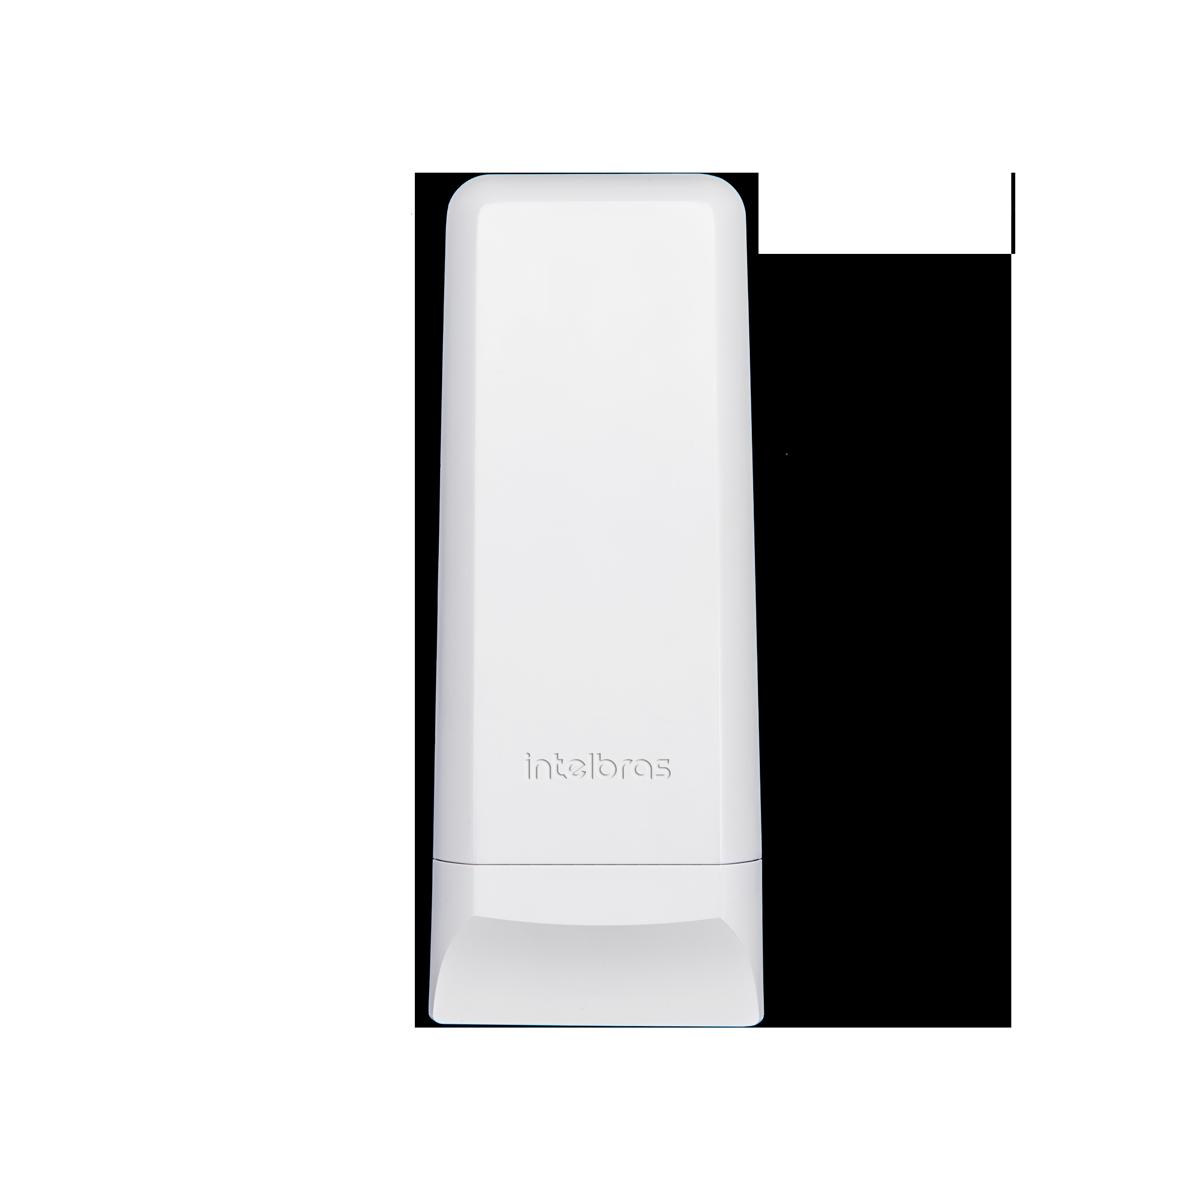 Antena WOM 5A Intelbras CPE 5Ghz 16 dBi Siso 1x1